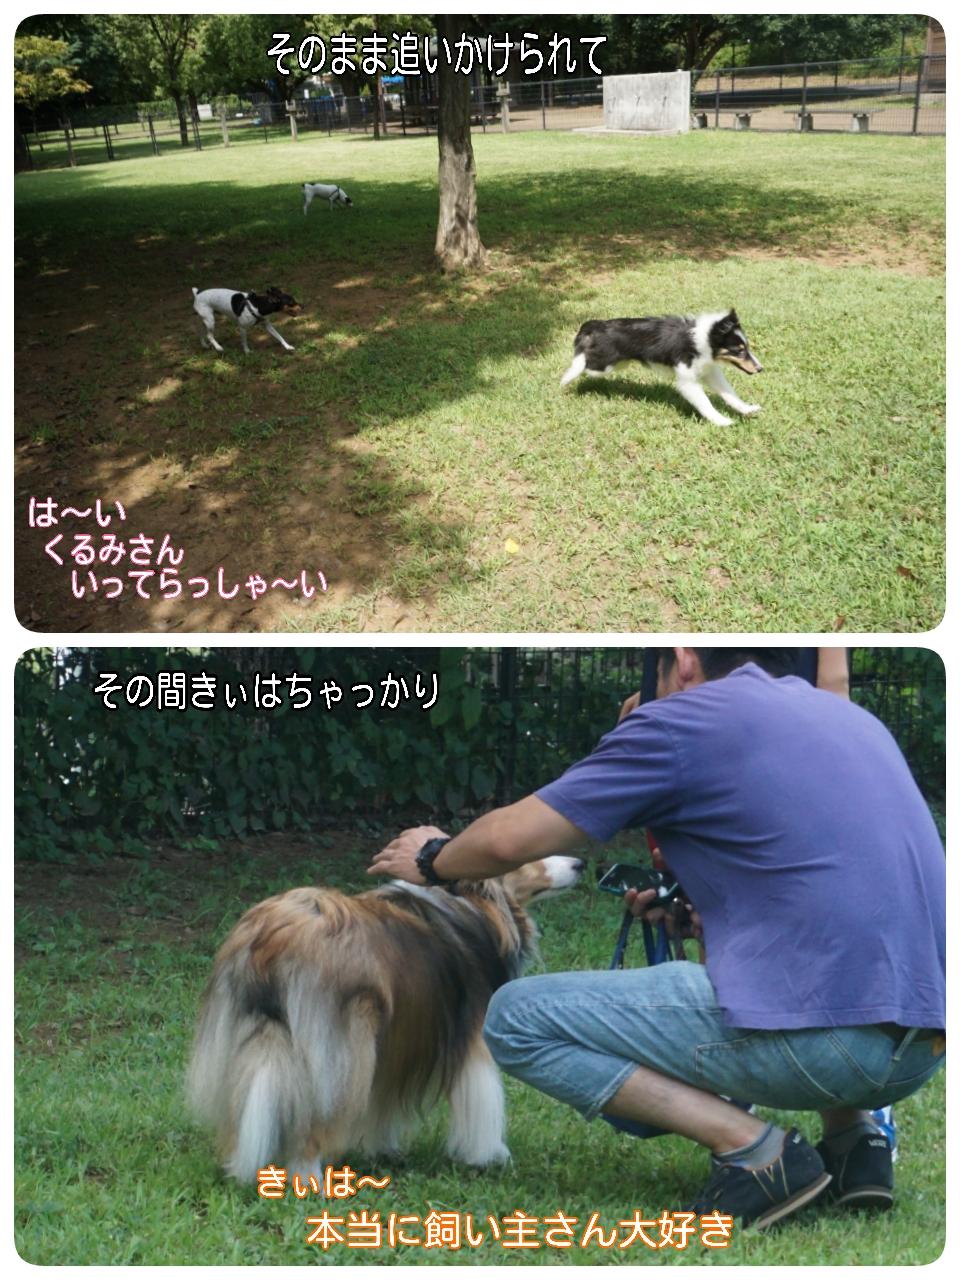 2015-08-09-16-53-13_deco.jpg